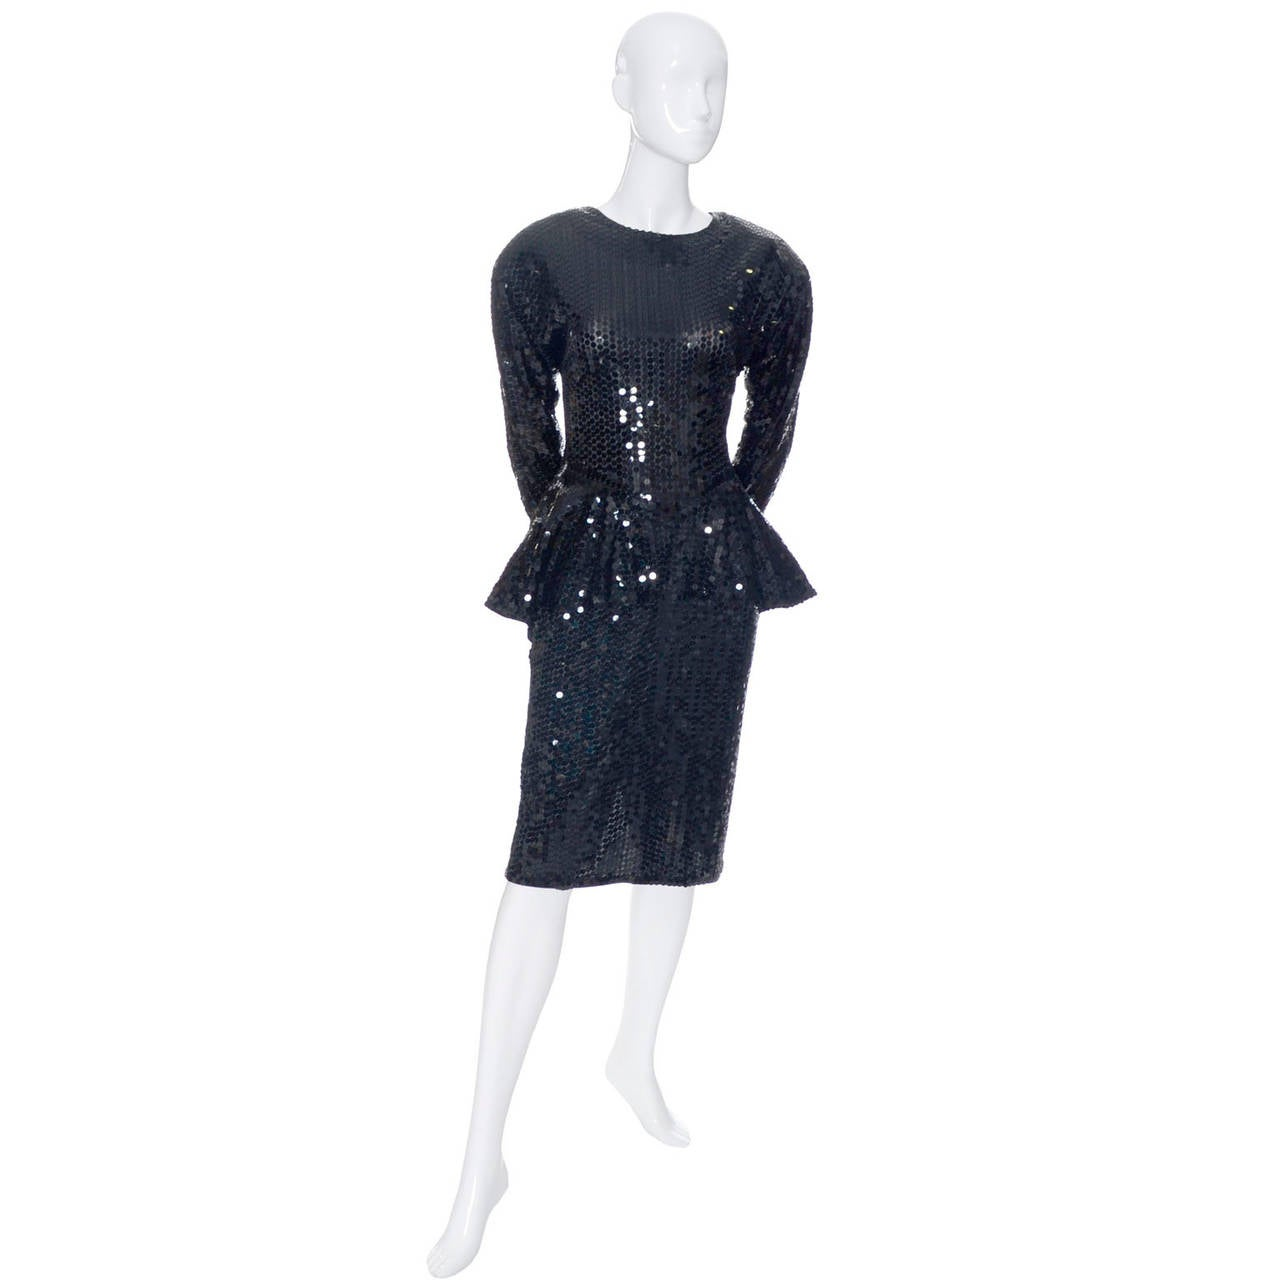 Oleg Cassini Vintage Dress Black Sequins Peplum 1980s Evening In Excellent Condition For Sale In Portland, OR